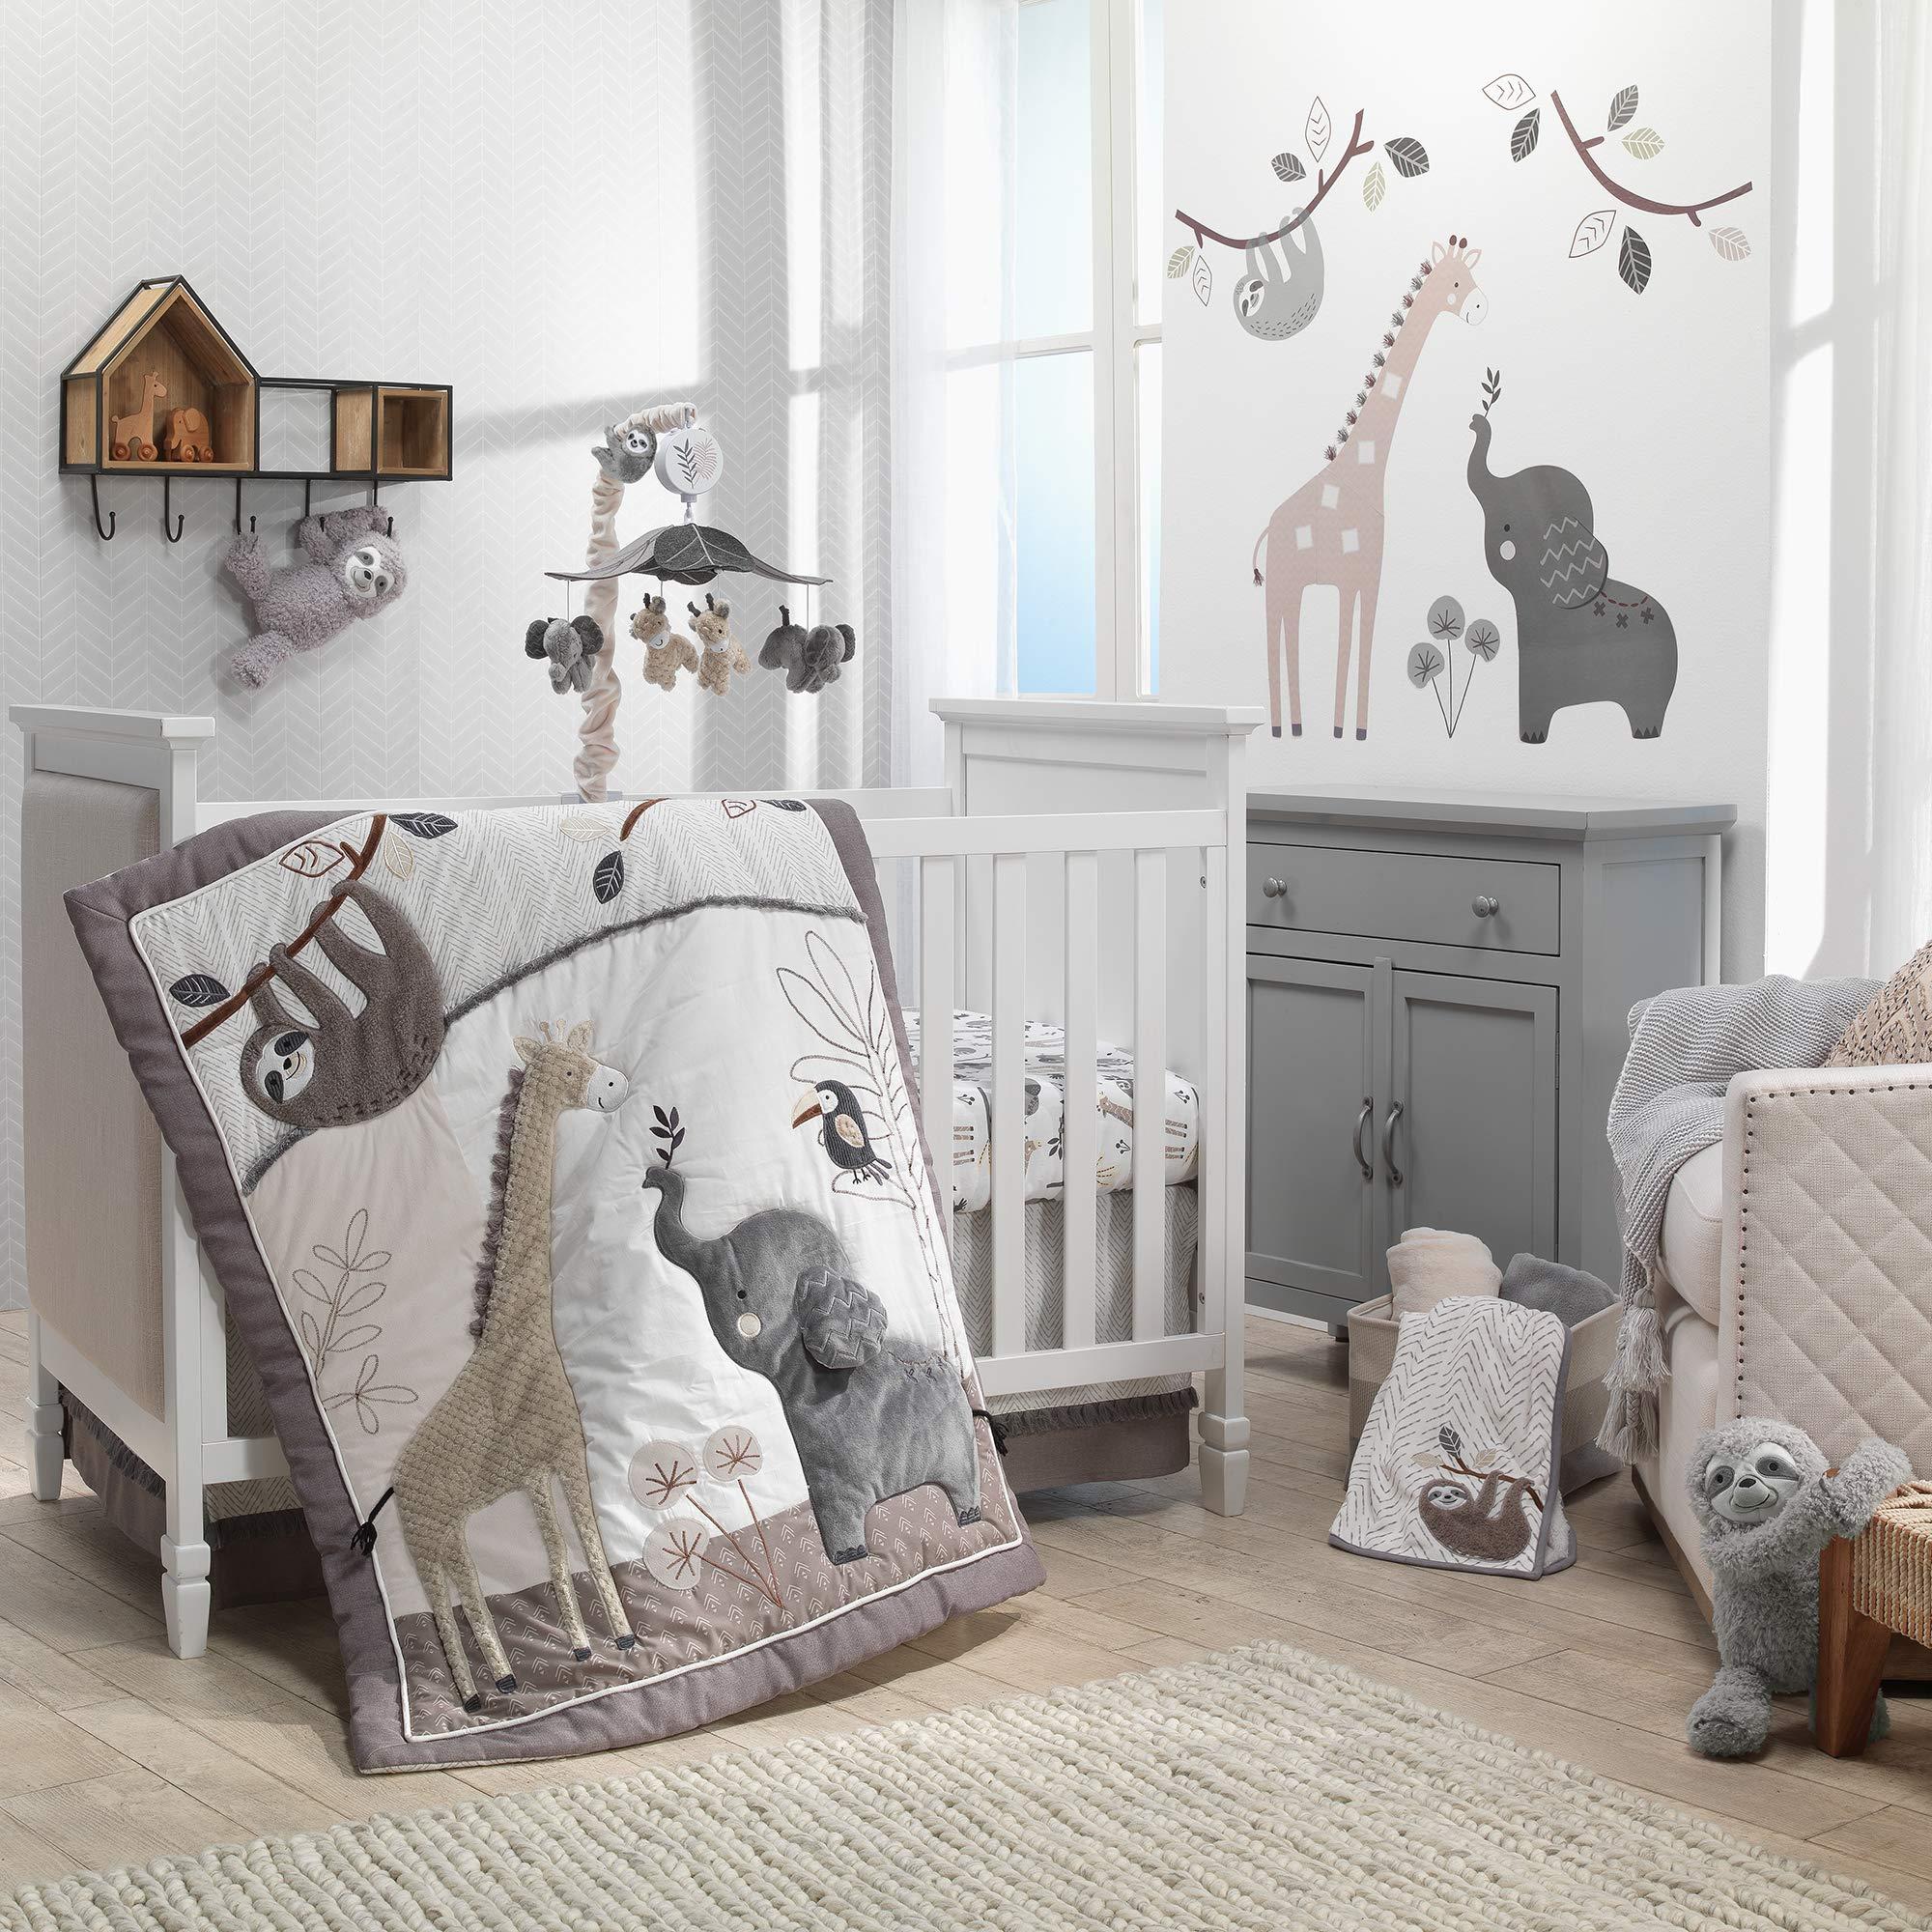 Lambs & Ivy Baby Jungle Animals 4-Piece Gray/White/Taupe Crib Bedding Set